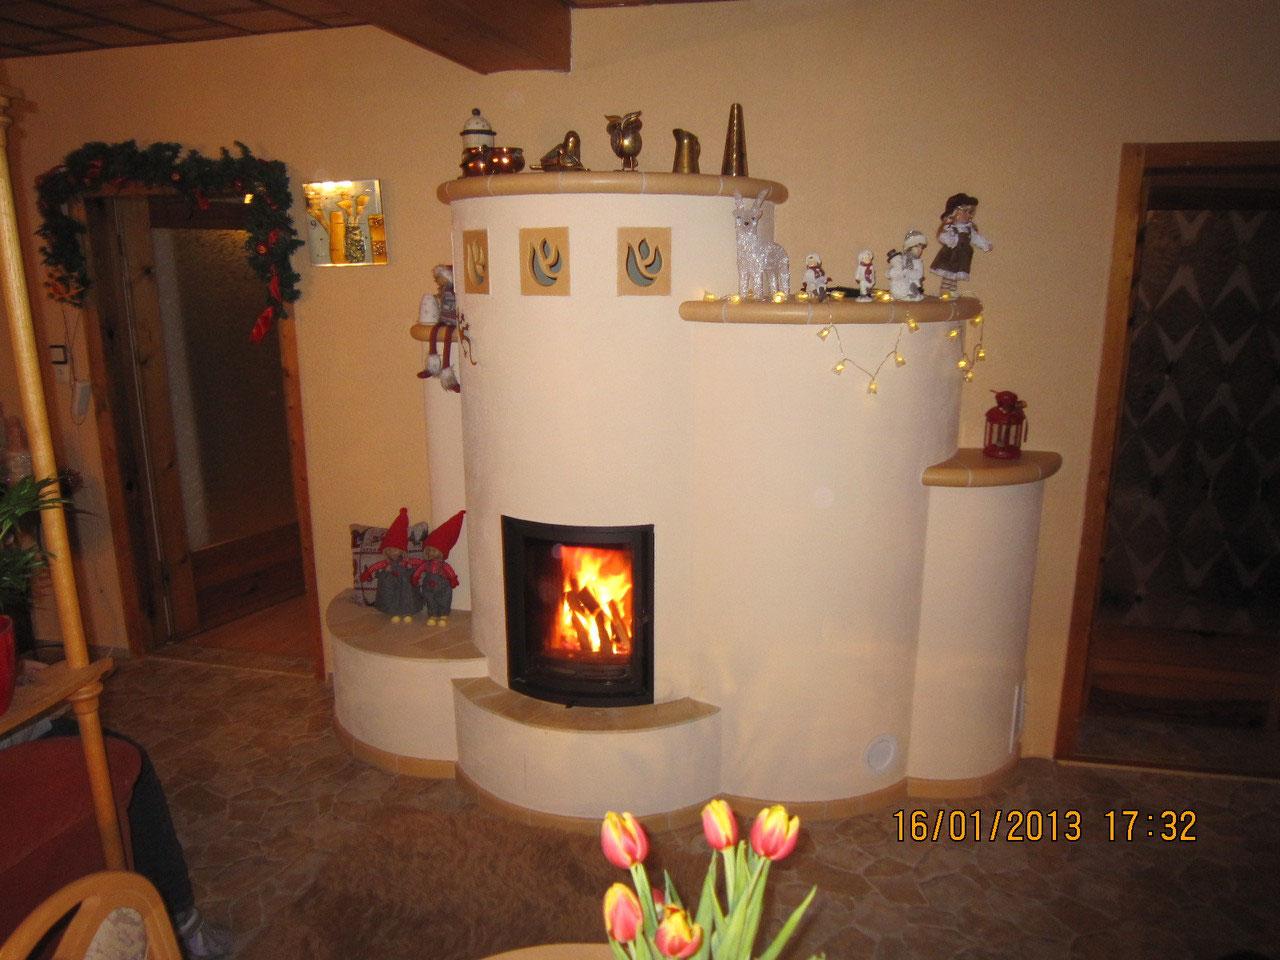 kachelofen chemin e fen ofenplanung kachel fen schweden fen chemin esanierung. Black Bedroom Furniture Sets. Home Design Ideas